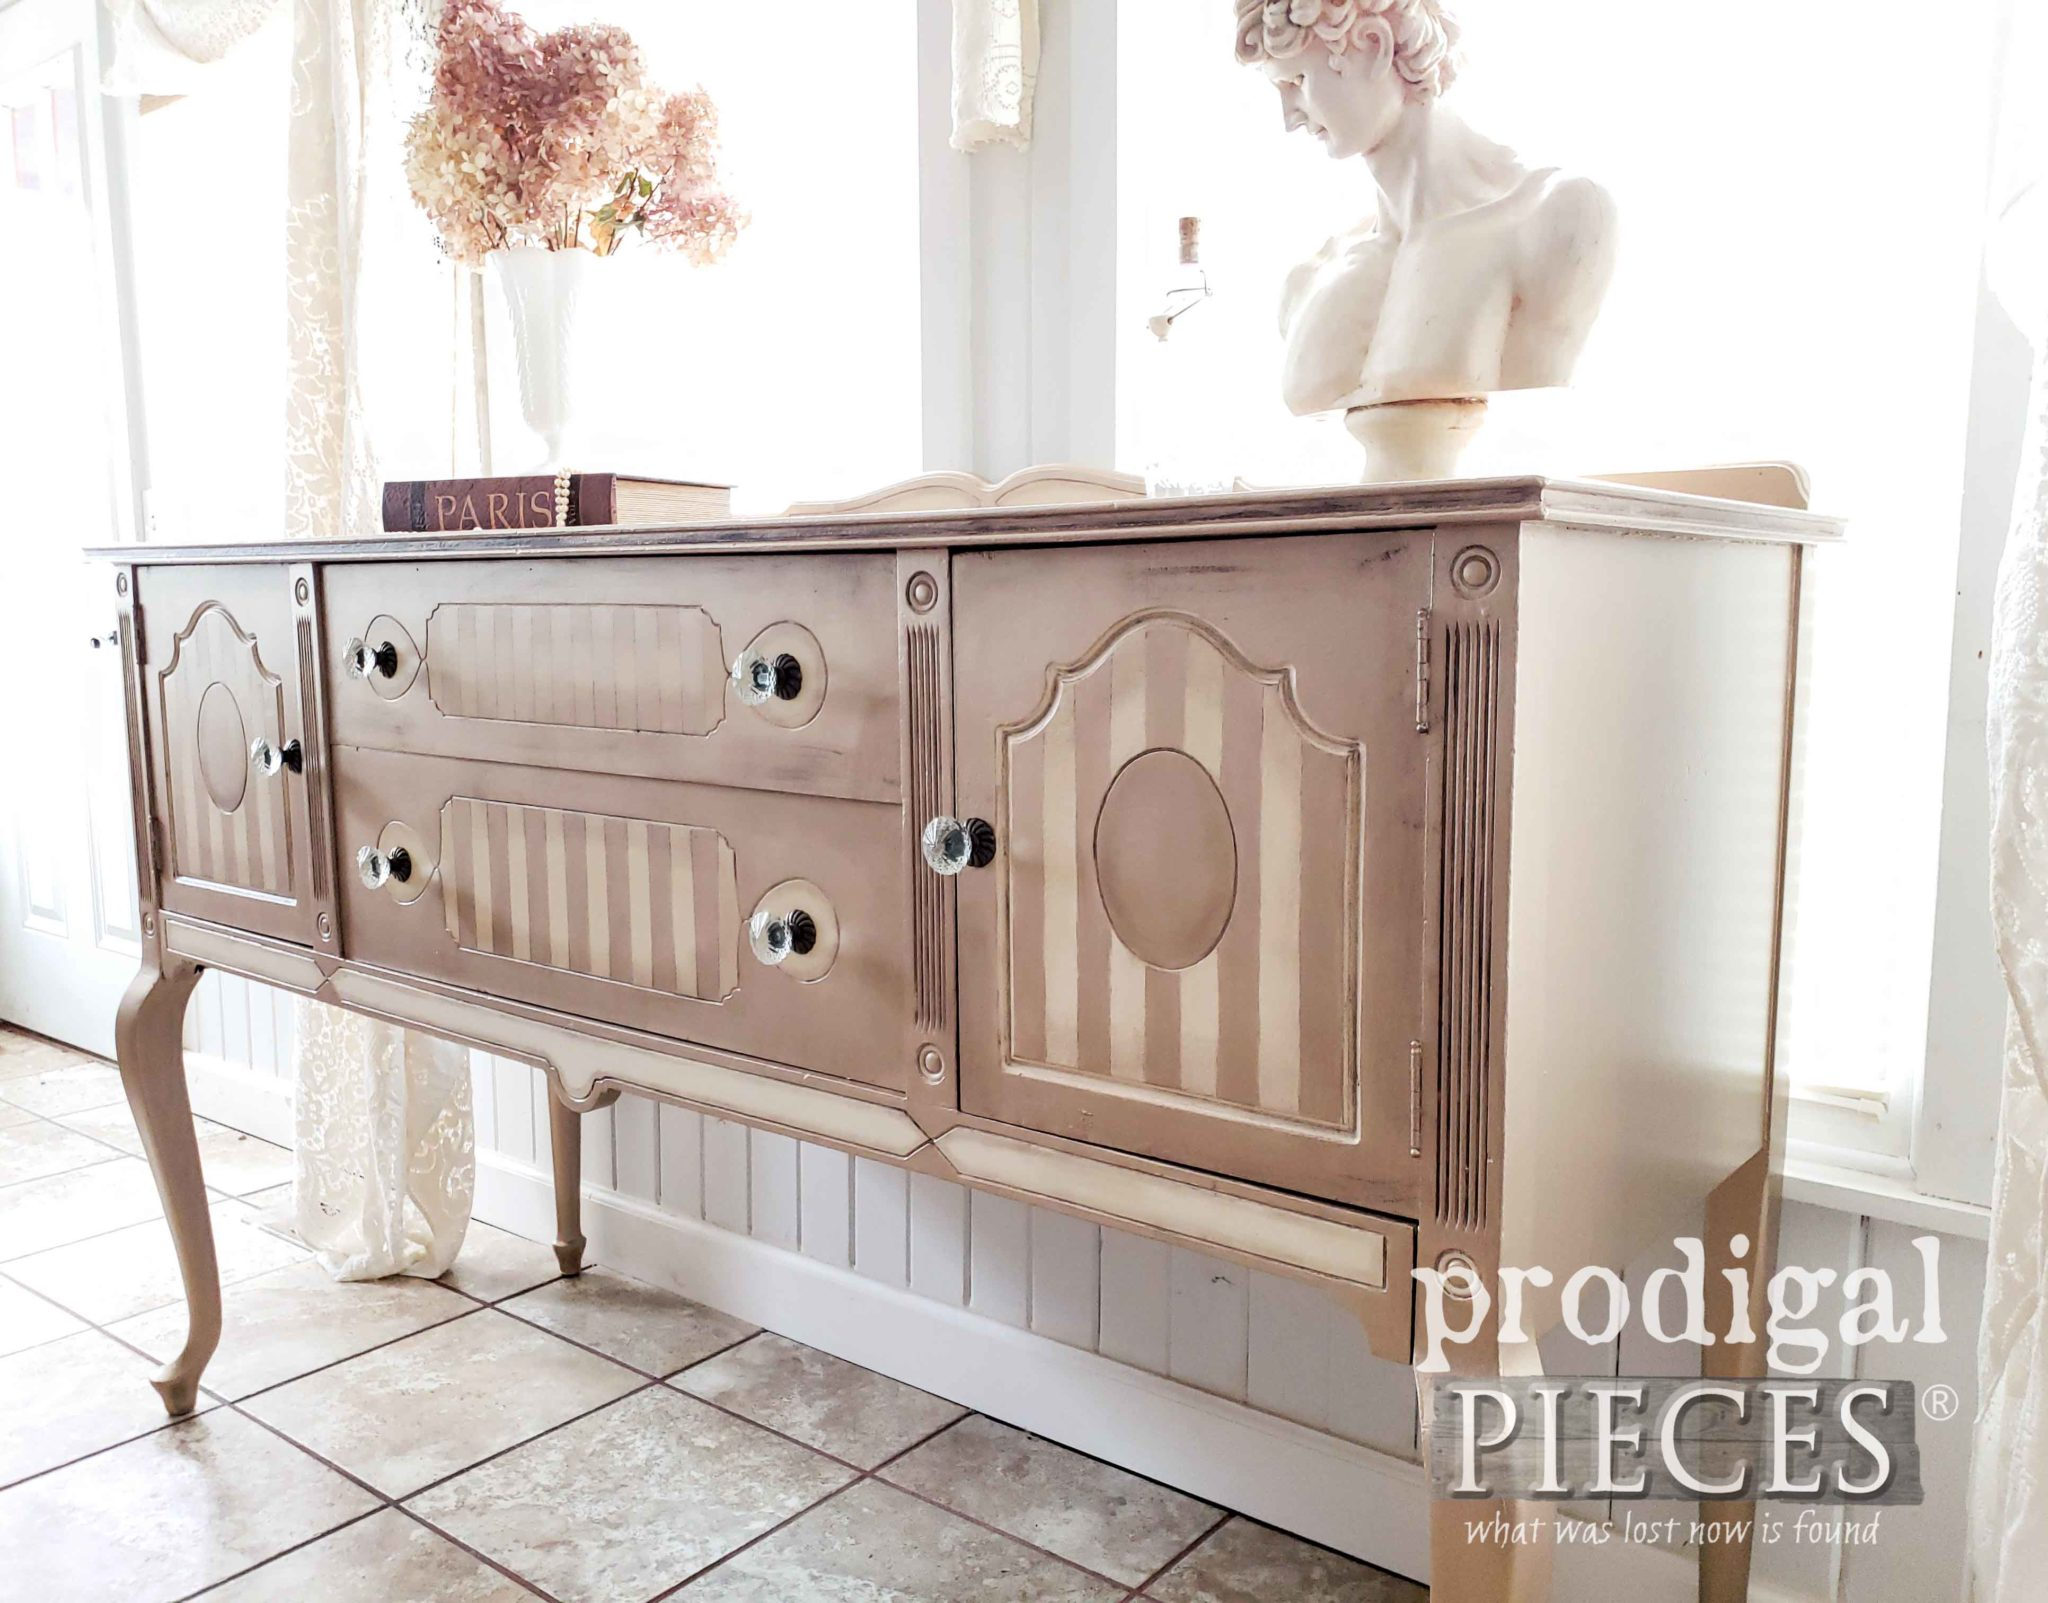 Metallic Antique Buffet Corner | by Larissa of Prodigal Pieces | prodigalpieces.com #prodigalpieces #furniture #home #homedecor #diy